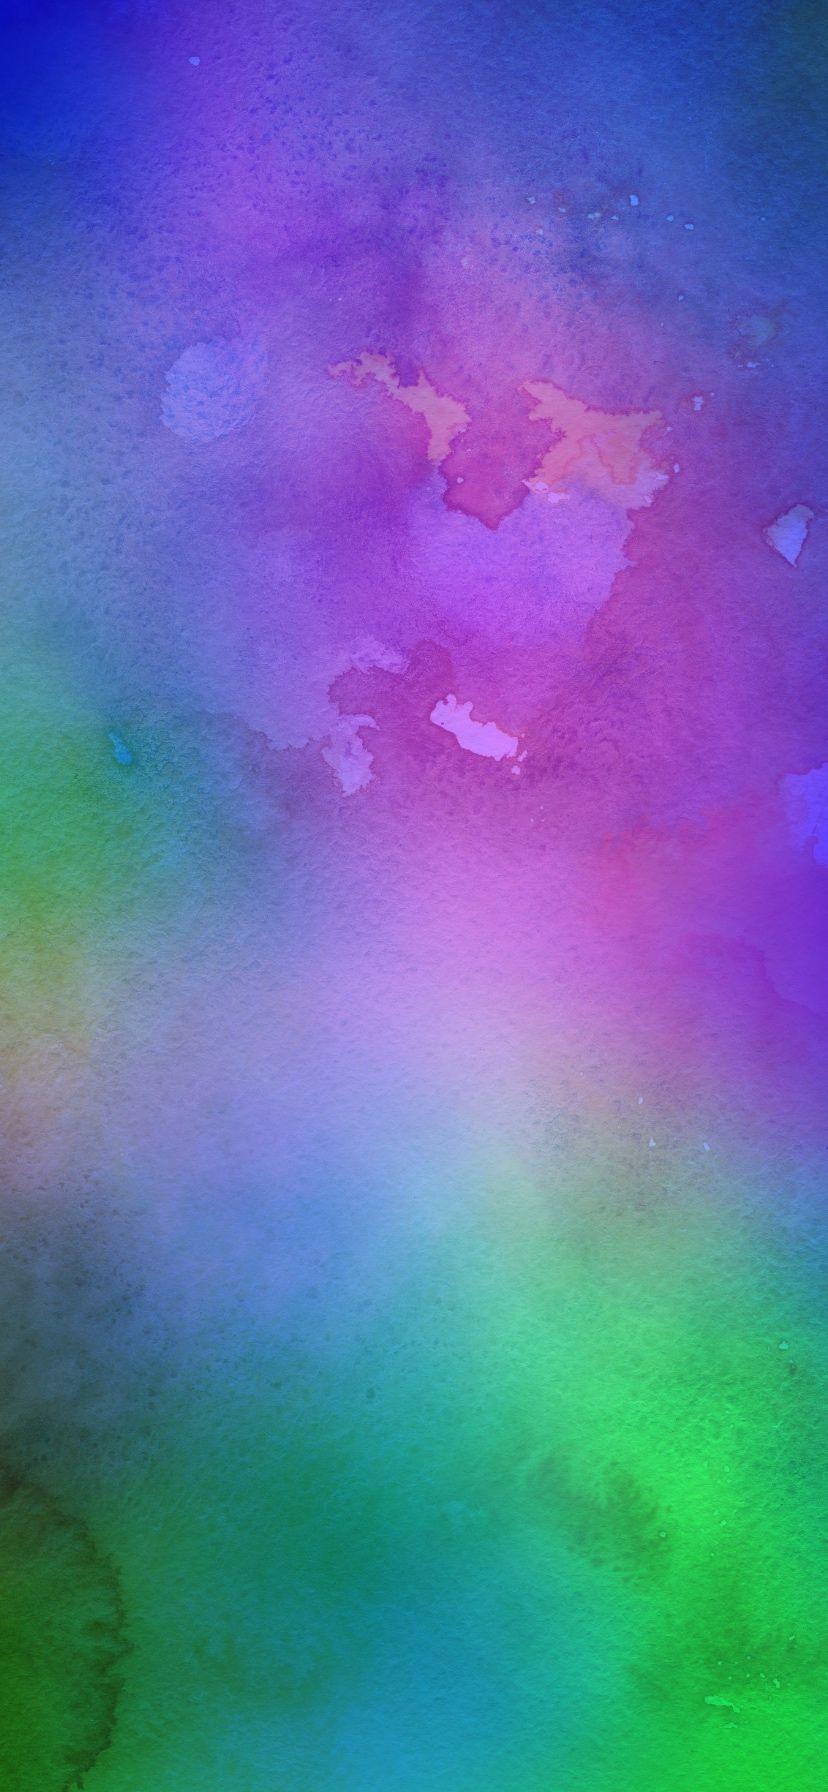 Aesthetic Iphone 11 Pro Wallpaper Download Free hd 4k